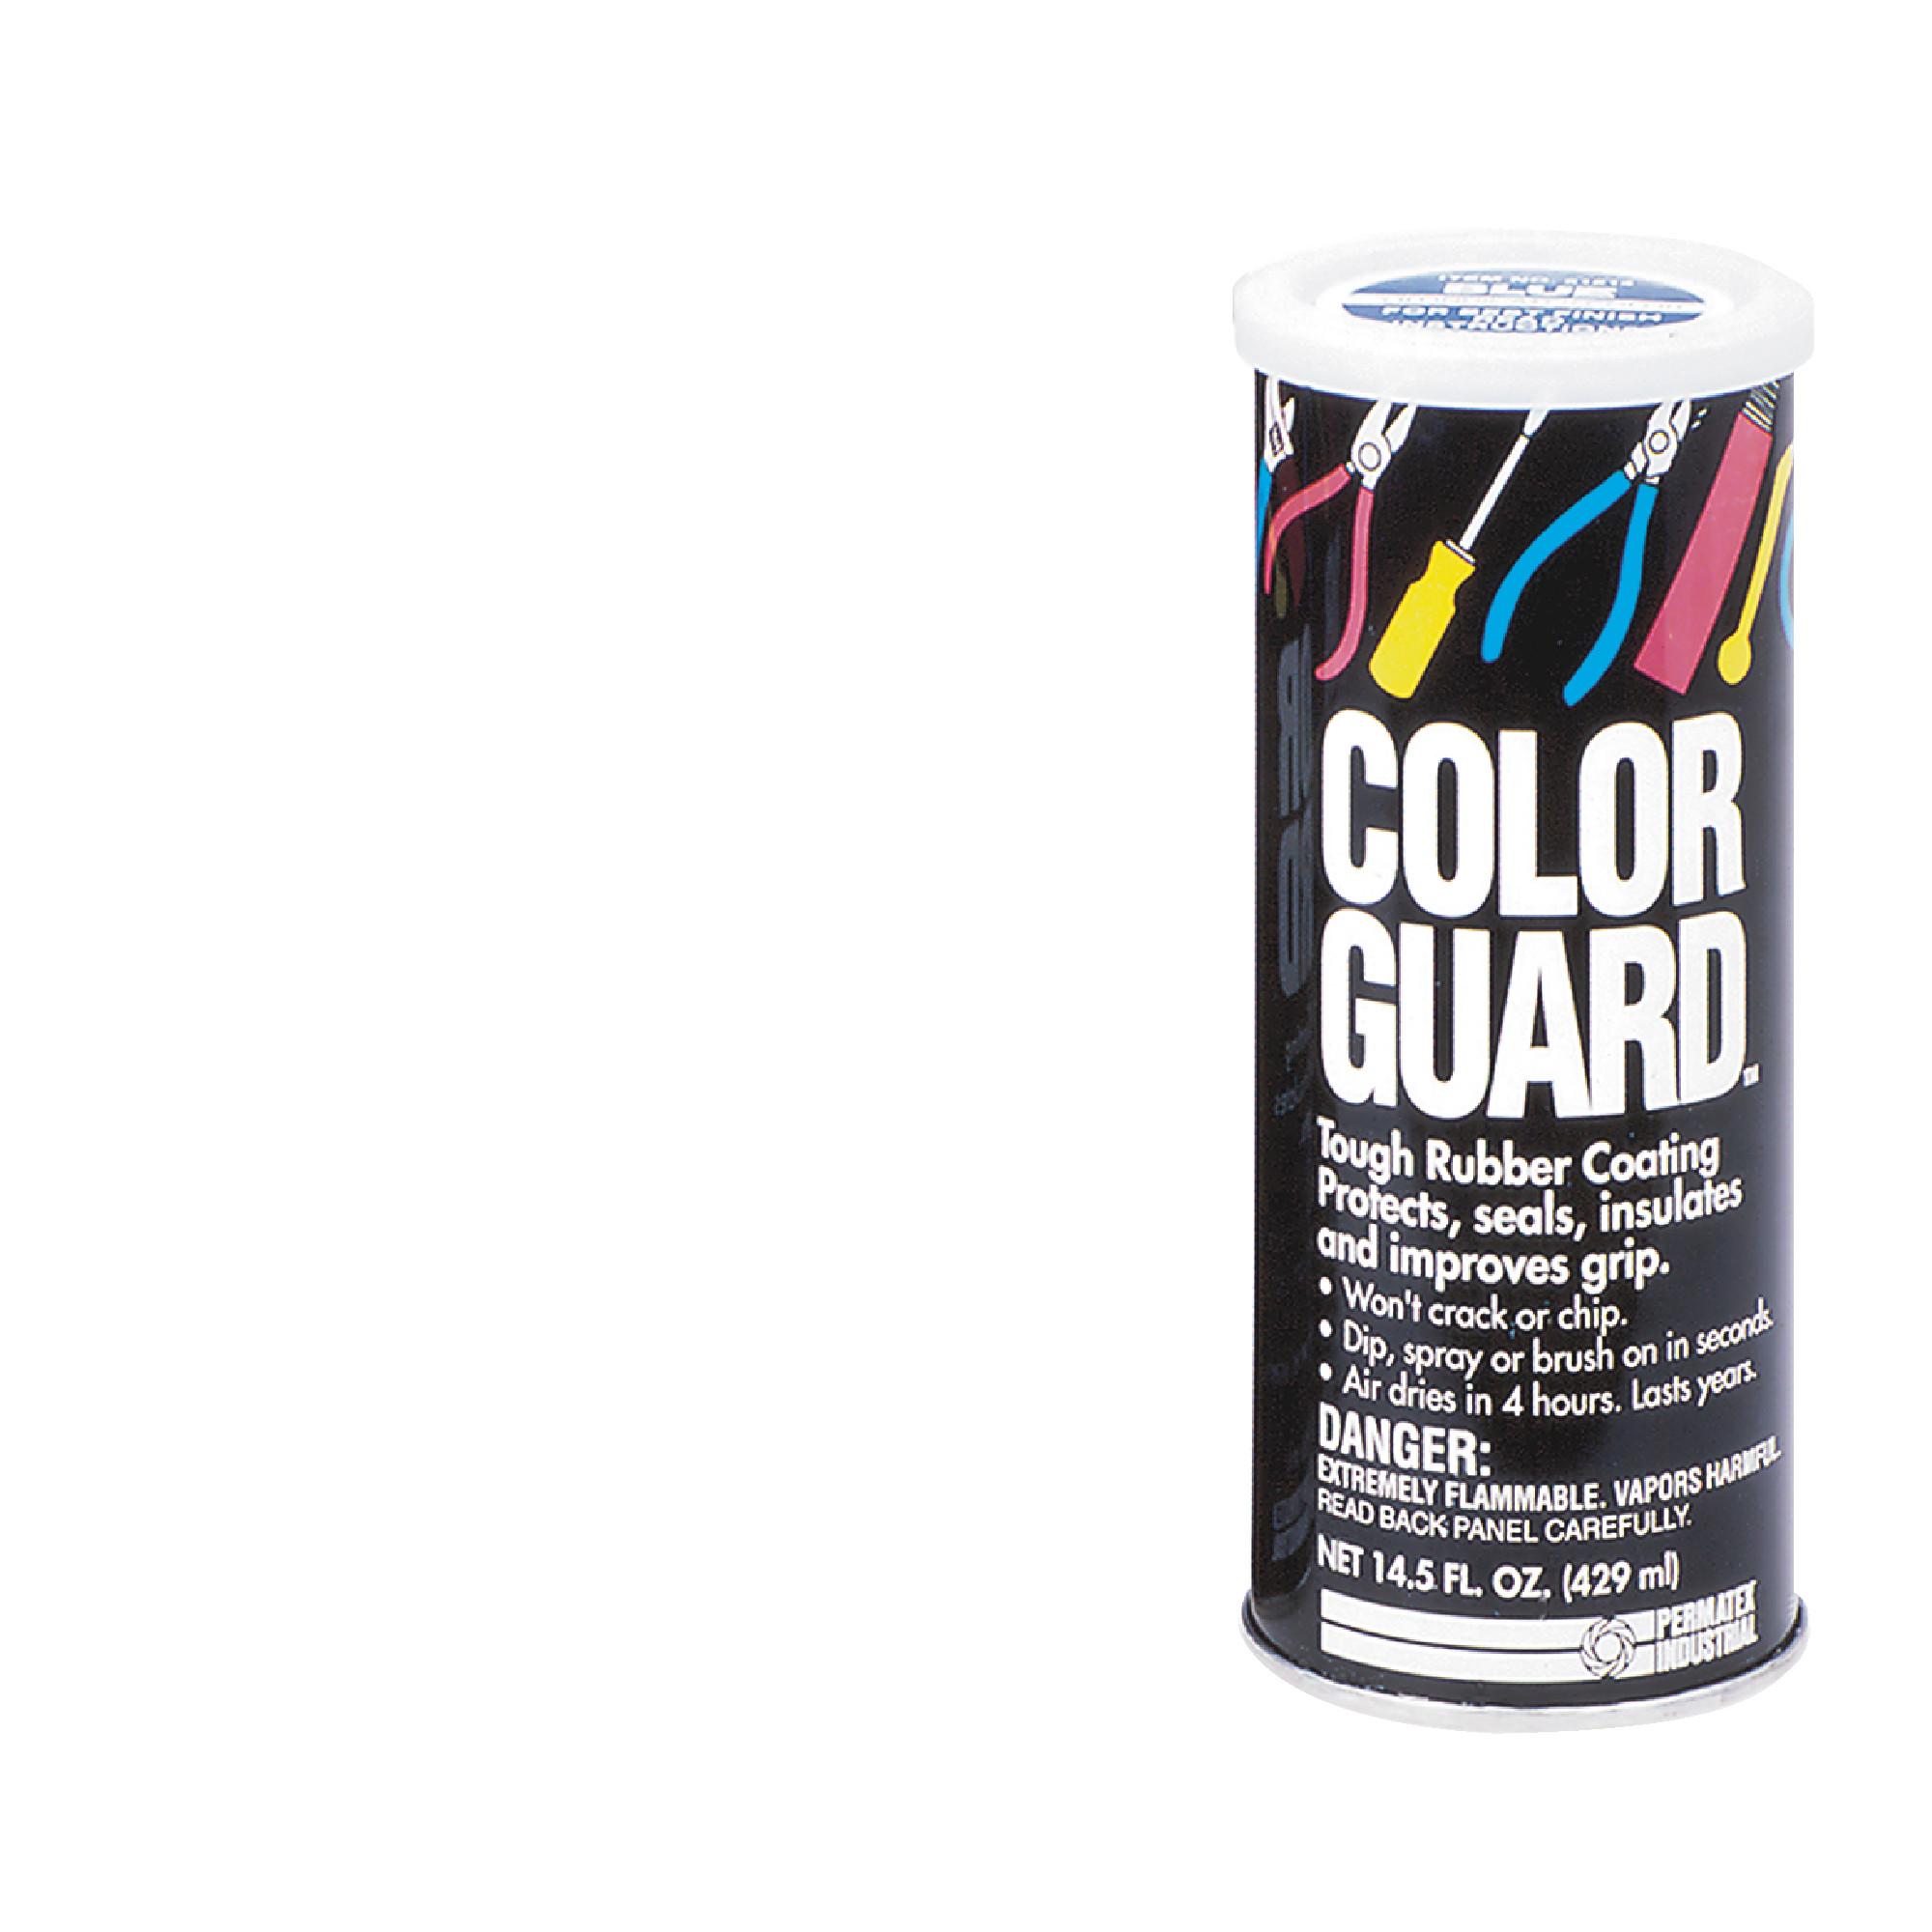 Color Guard® Tough Rubber Coating